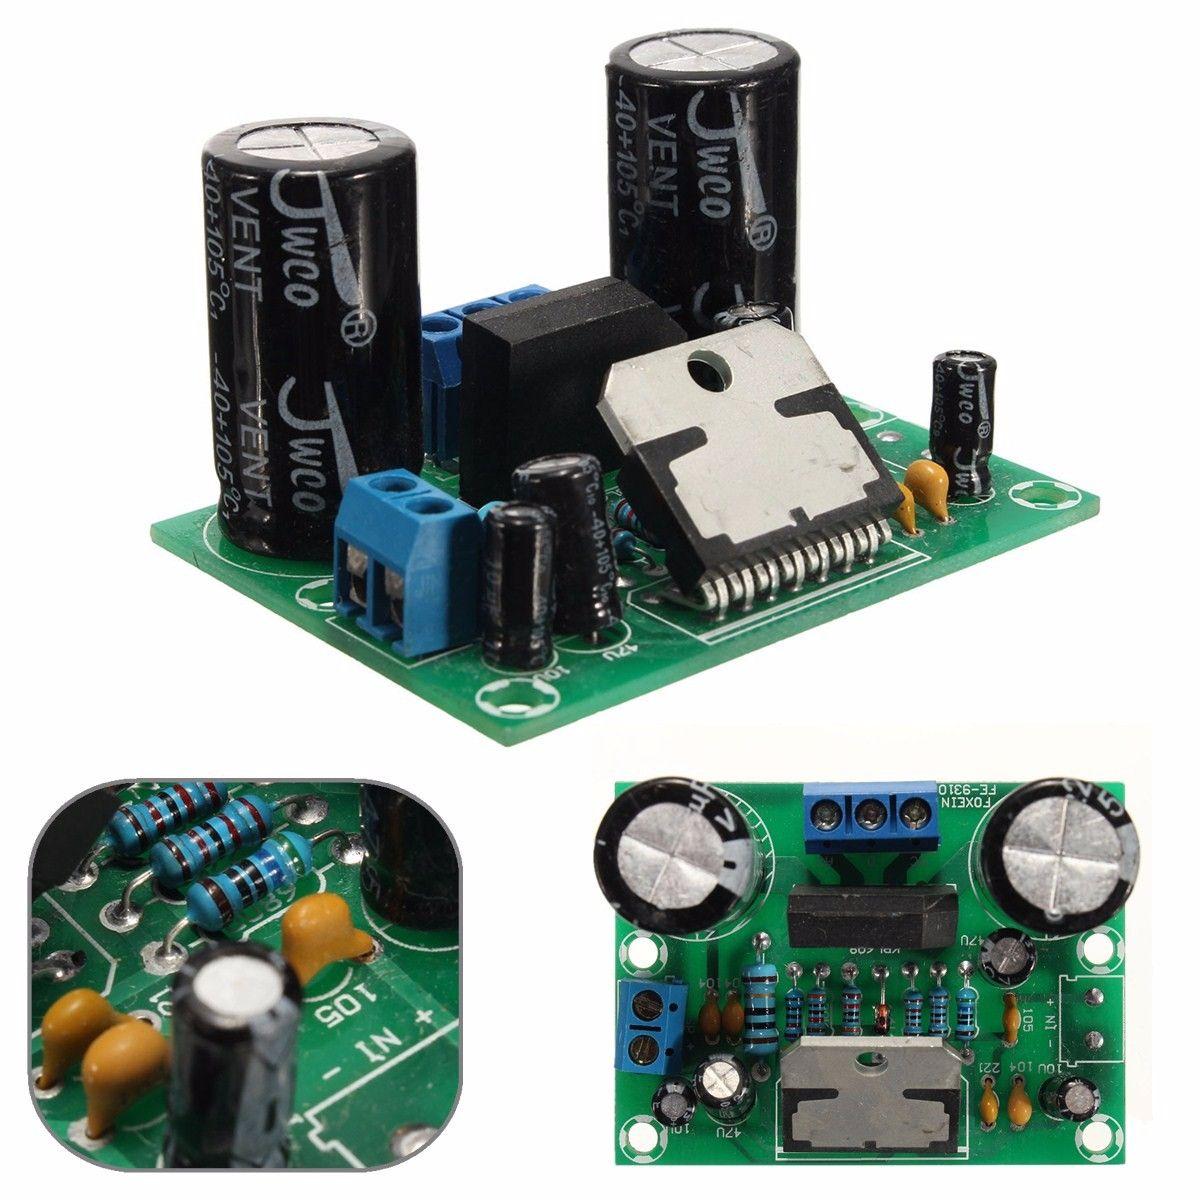 Amplifier For Tda7496sa Electronics T Tda7496 2x5 Watts Stereo Class Ab Audio Circuit Design 12 32v 100w Tda7293 Hifi Mono Board